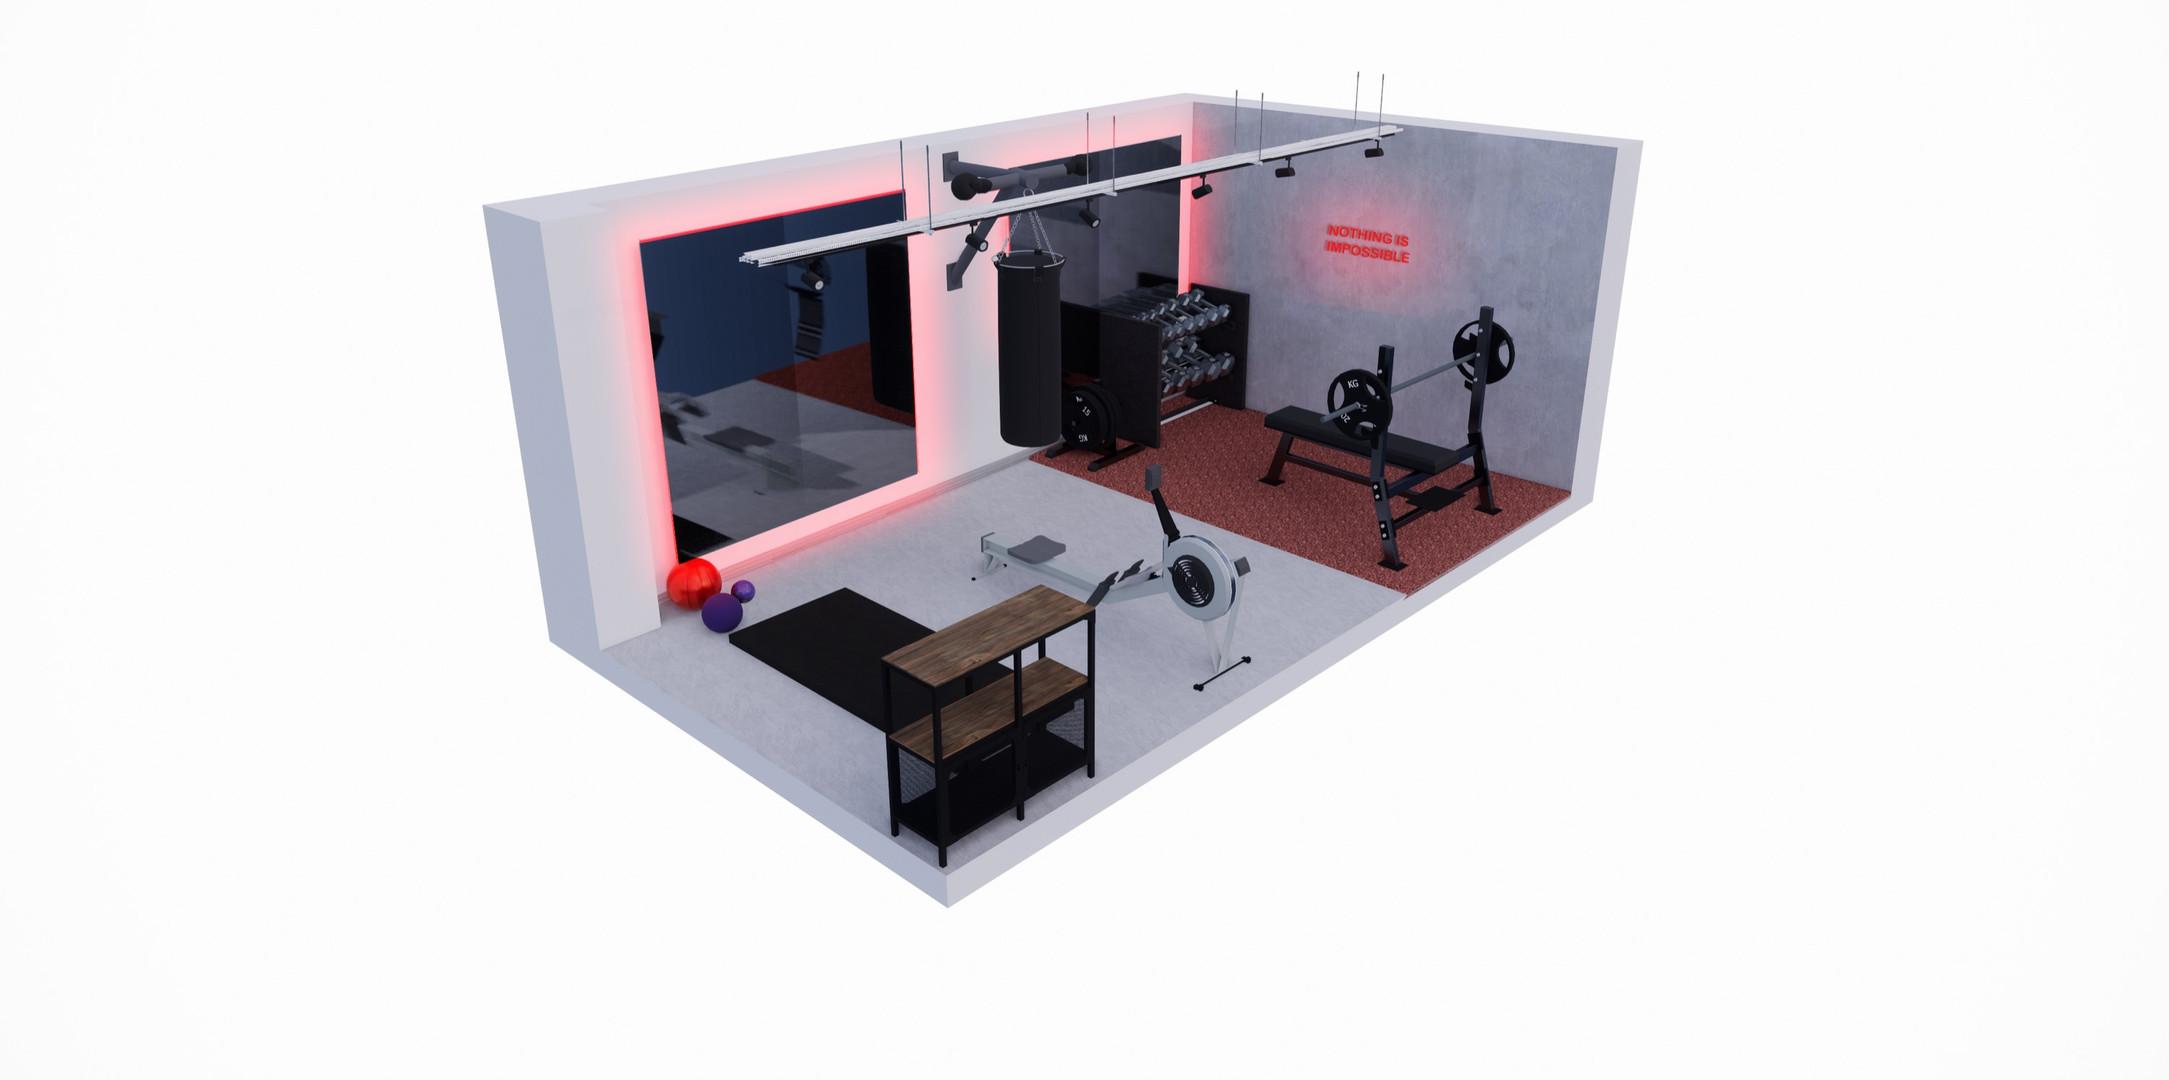 Concept Creation / 3D Visualisation